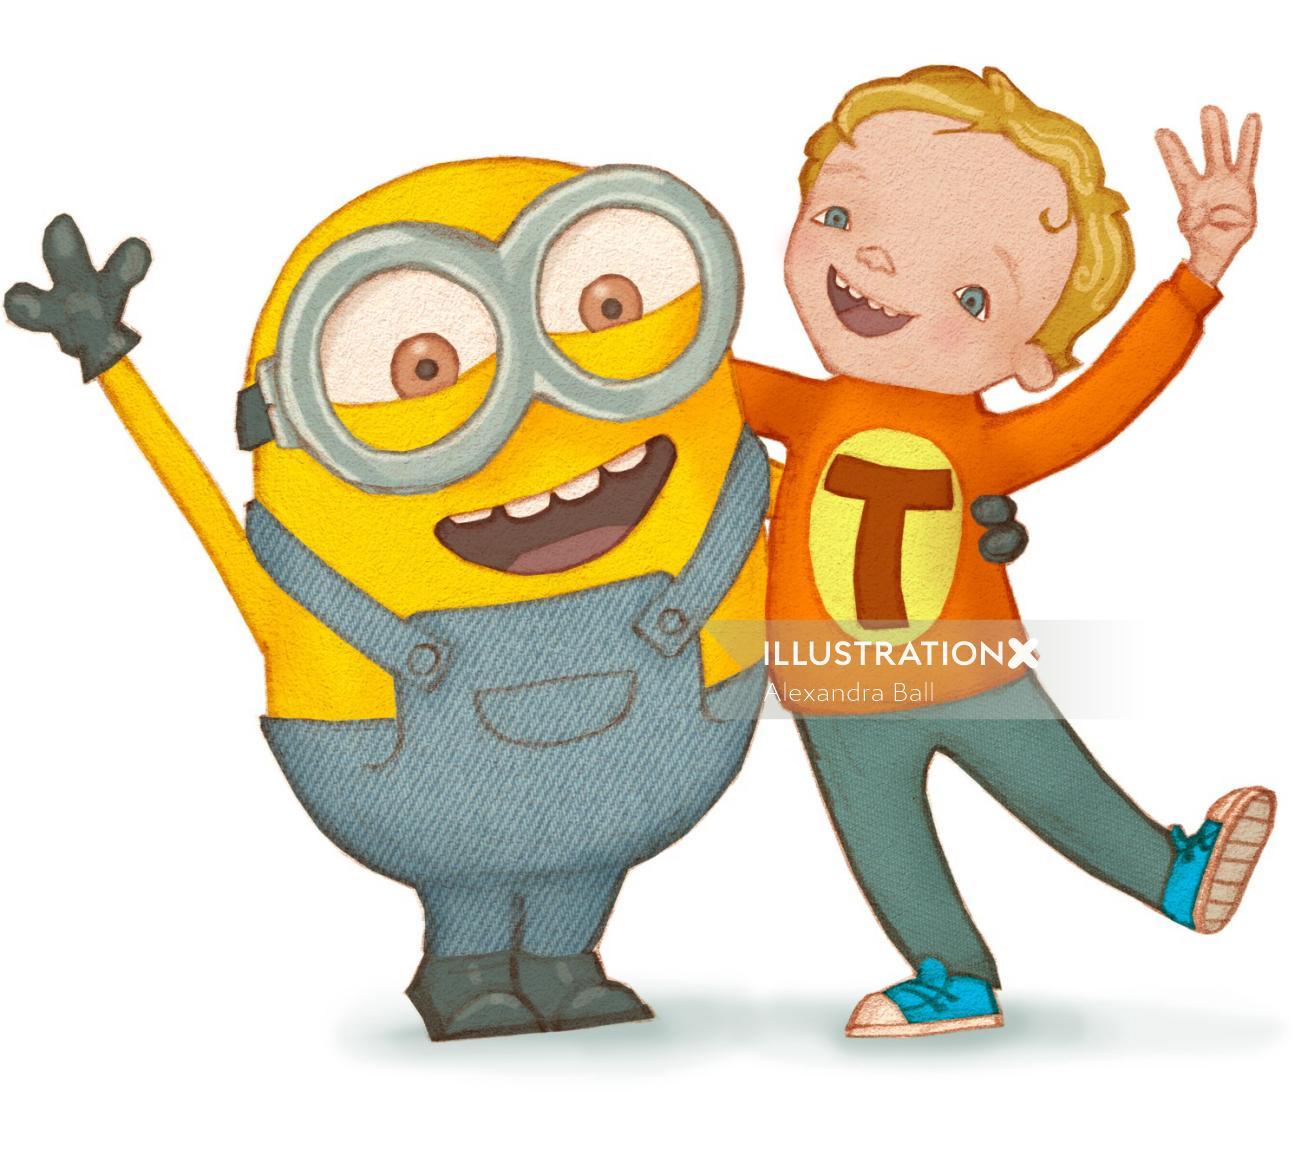 Cartoon illustration of a boy and a minion